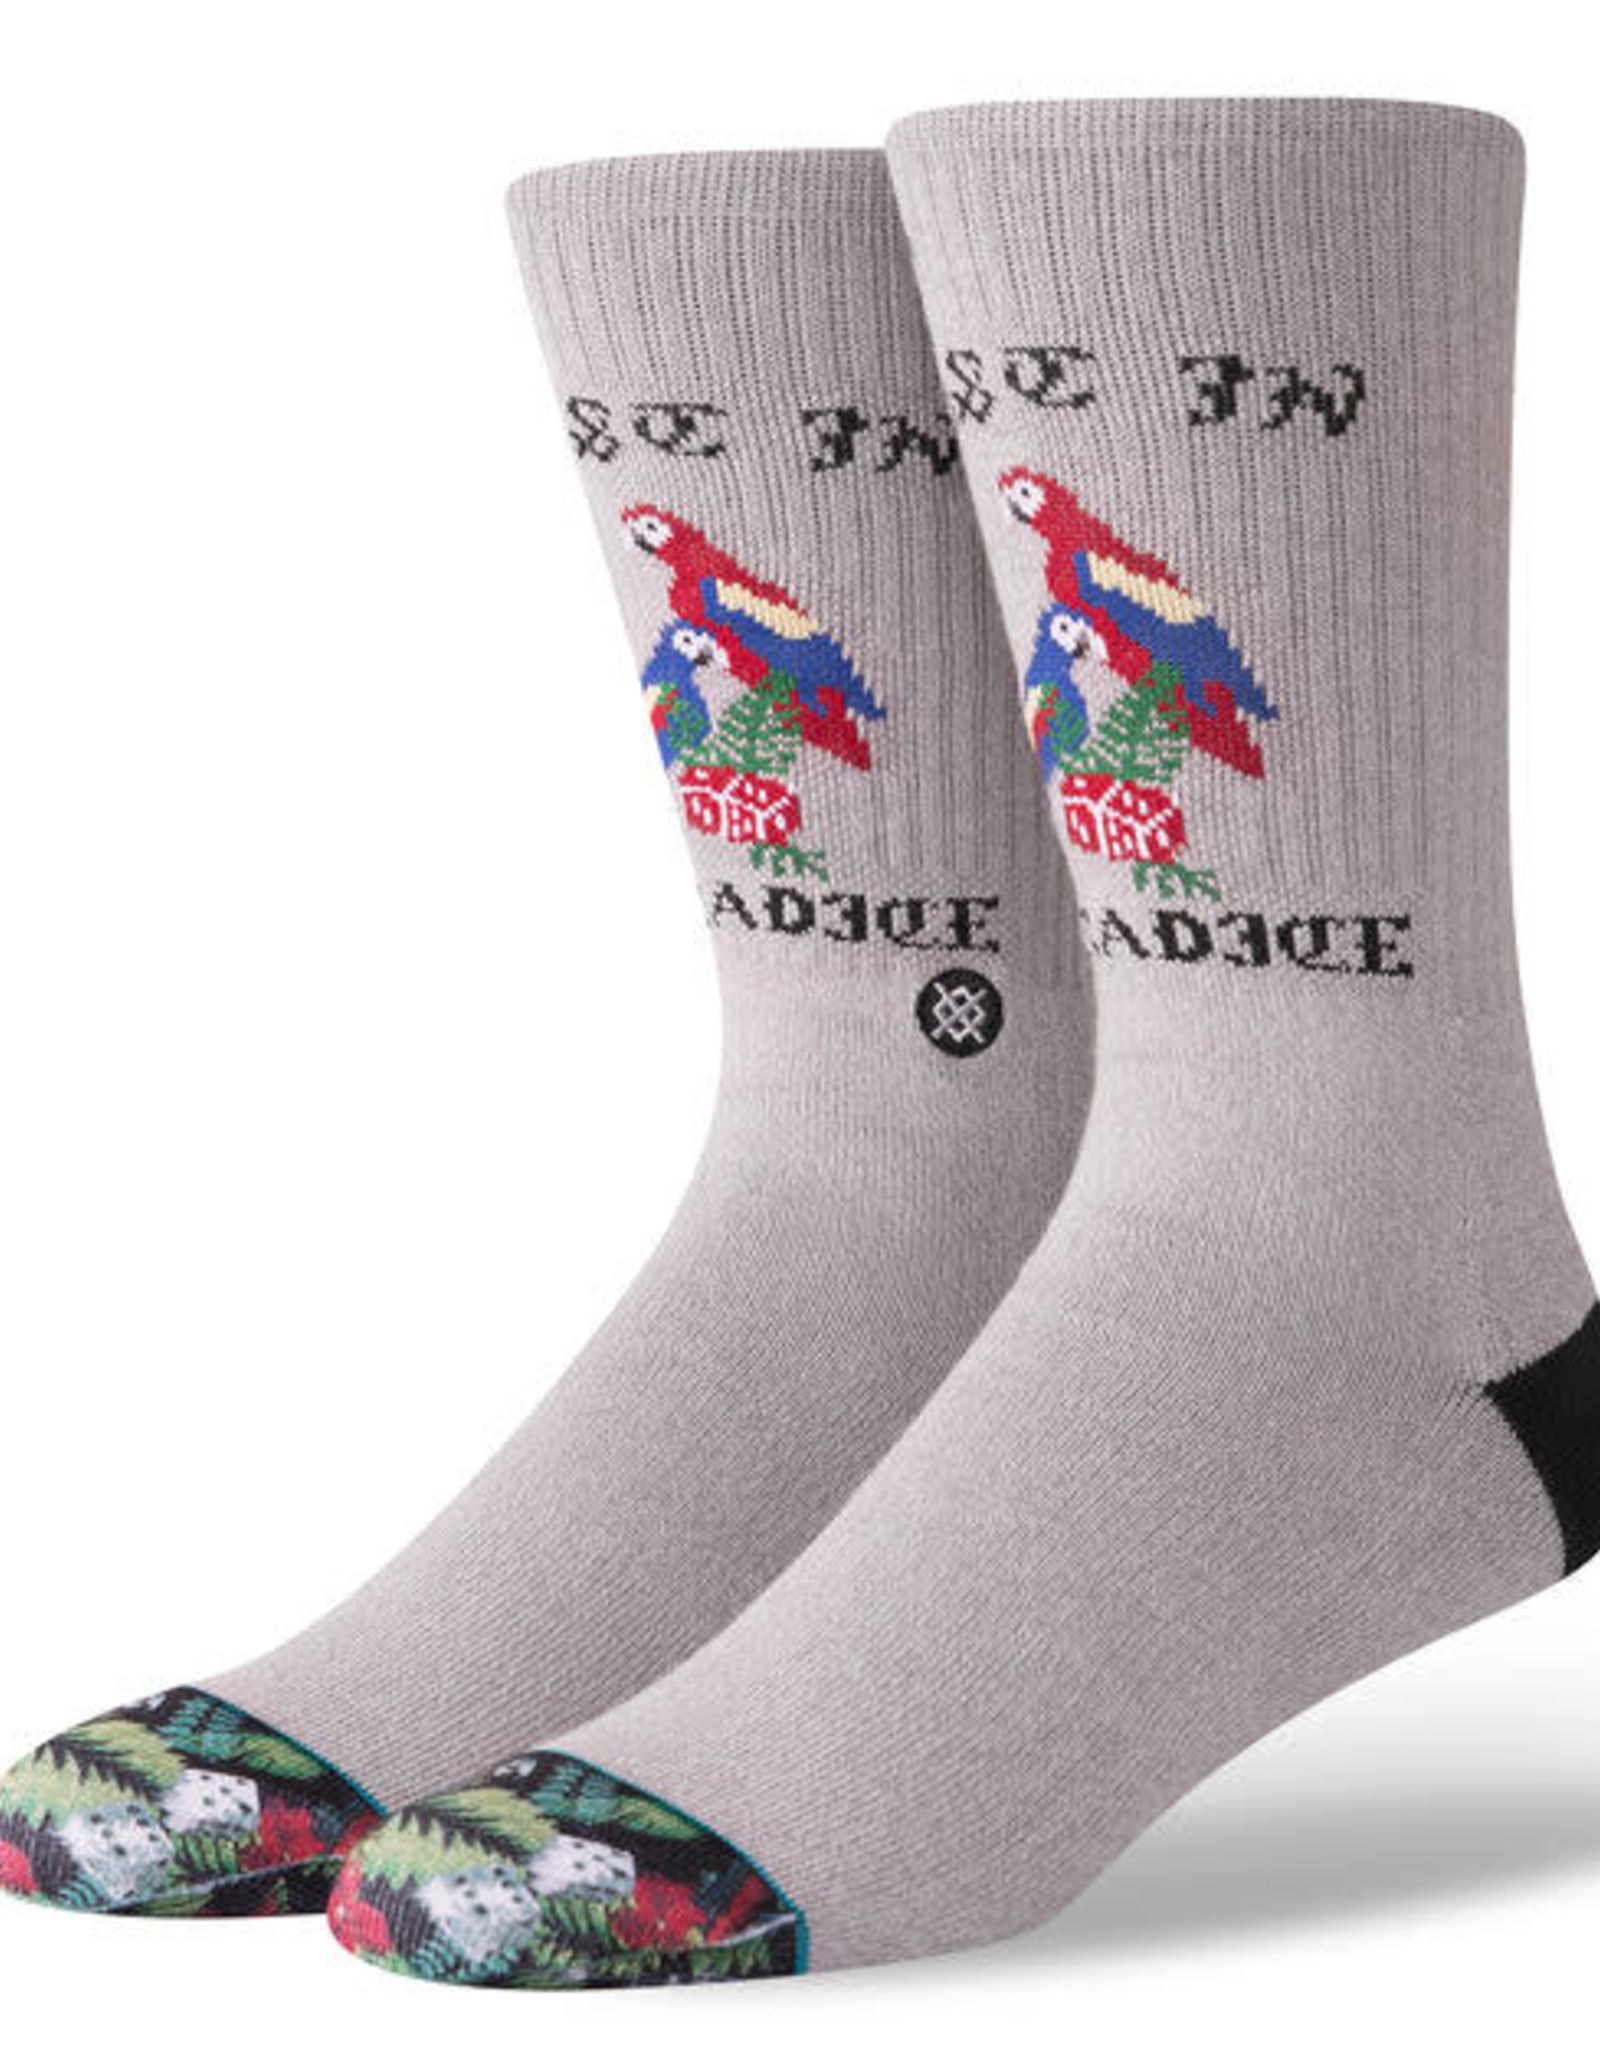 STANCE - Paradice Socks